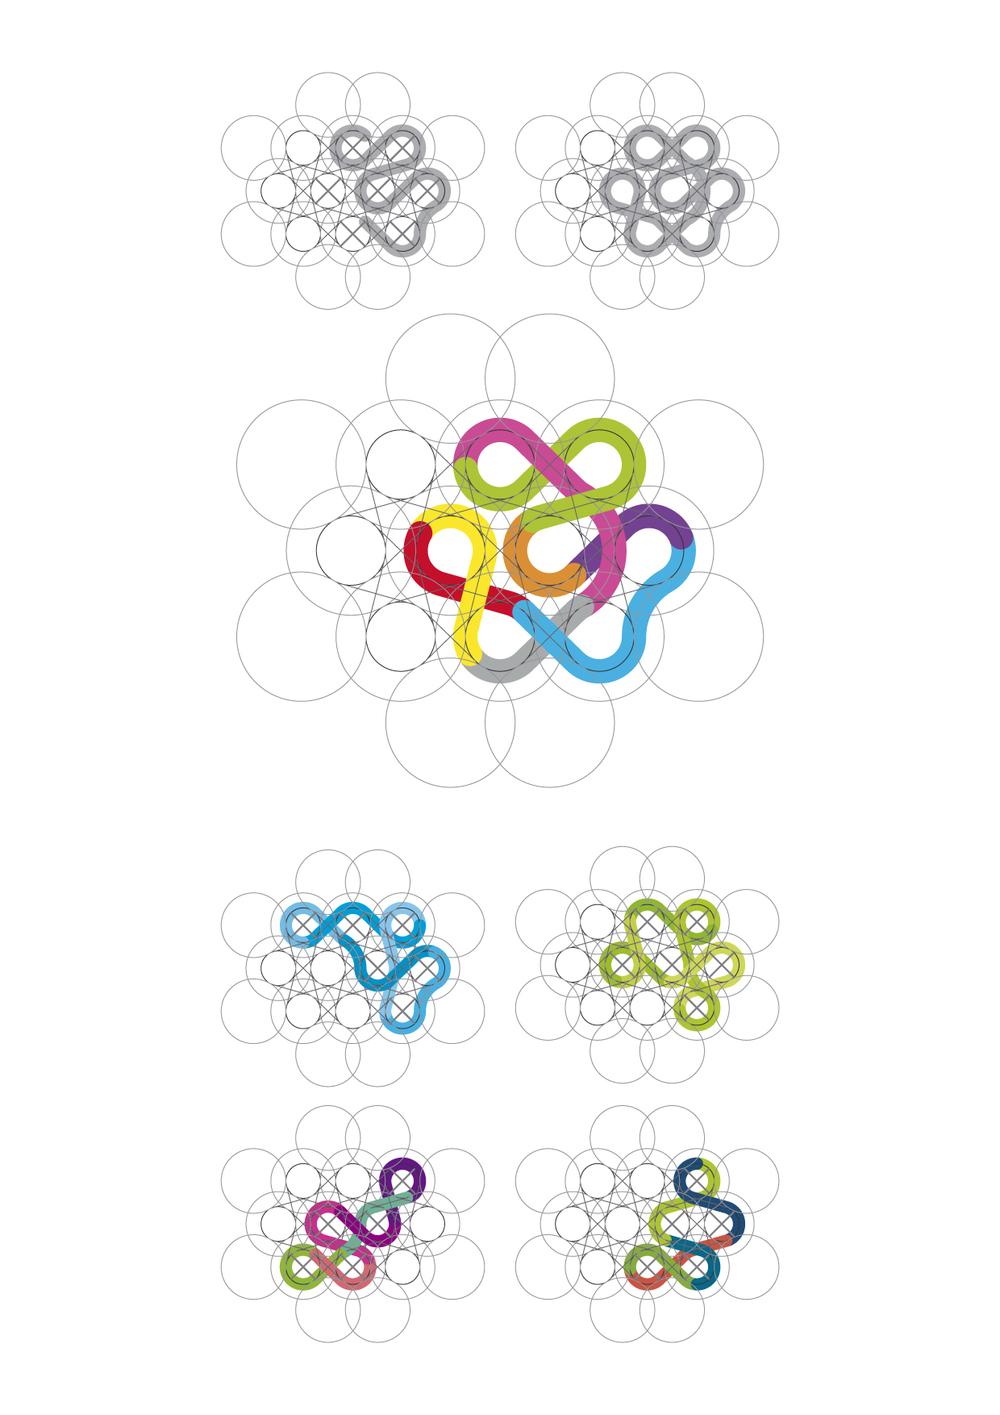 system-flow-logo-01.jpg